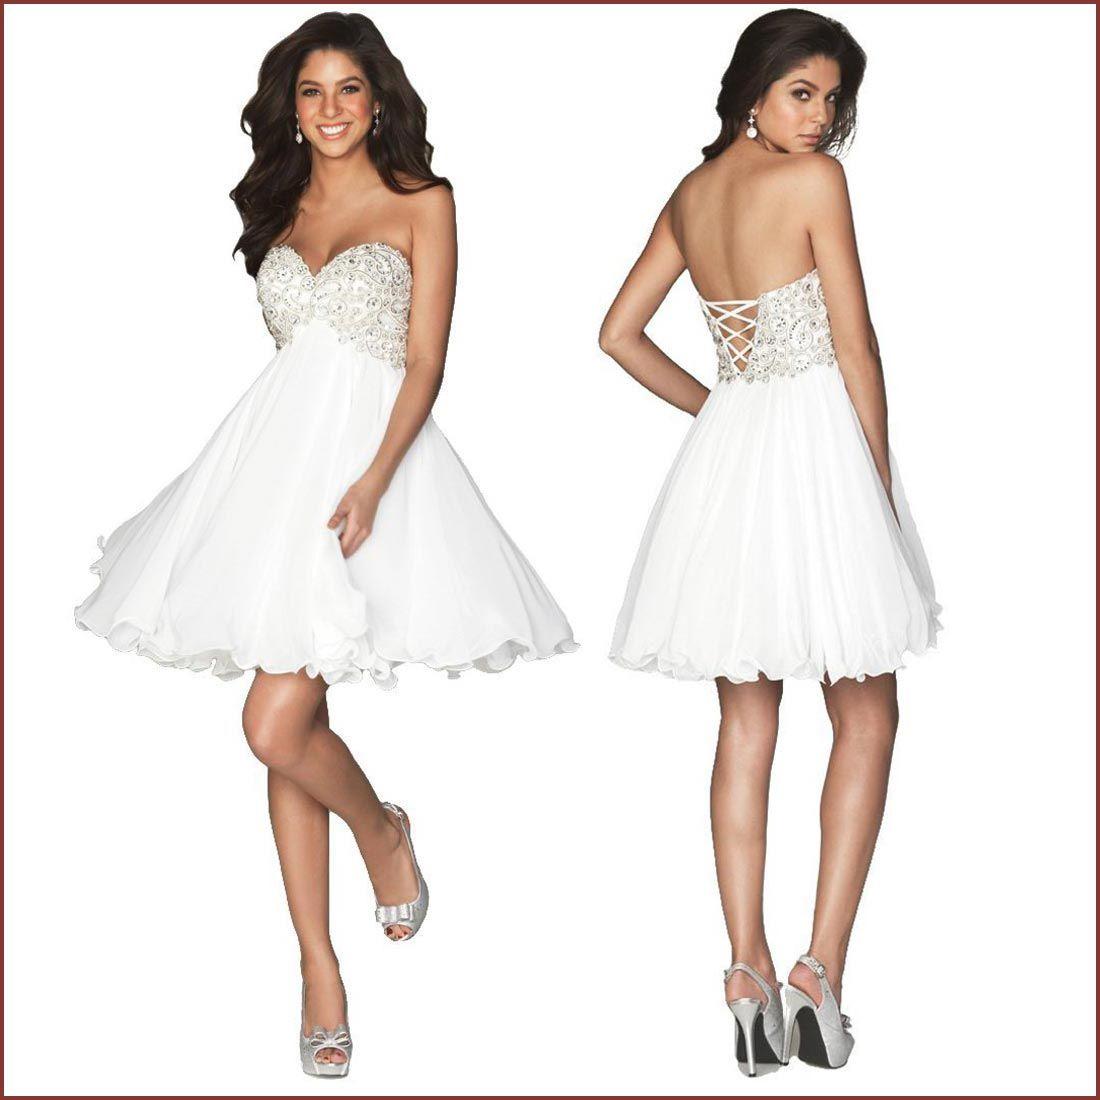 77 Cheap Wedding Dresses Under 50 Cute Dresses For A Wedding